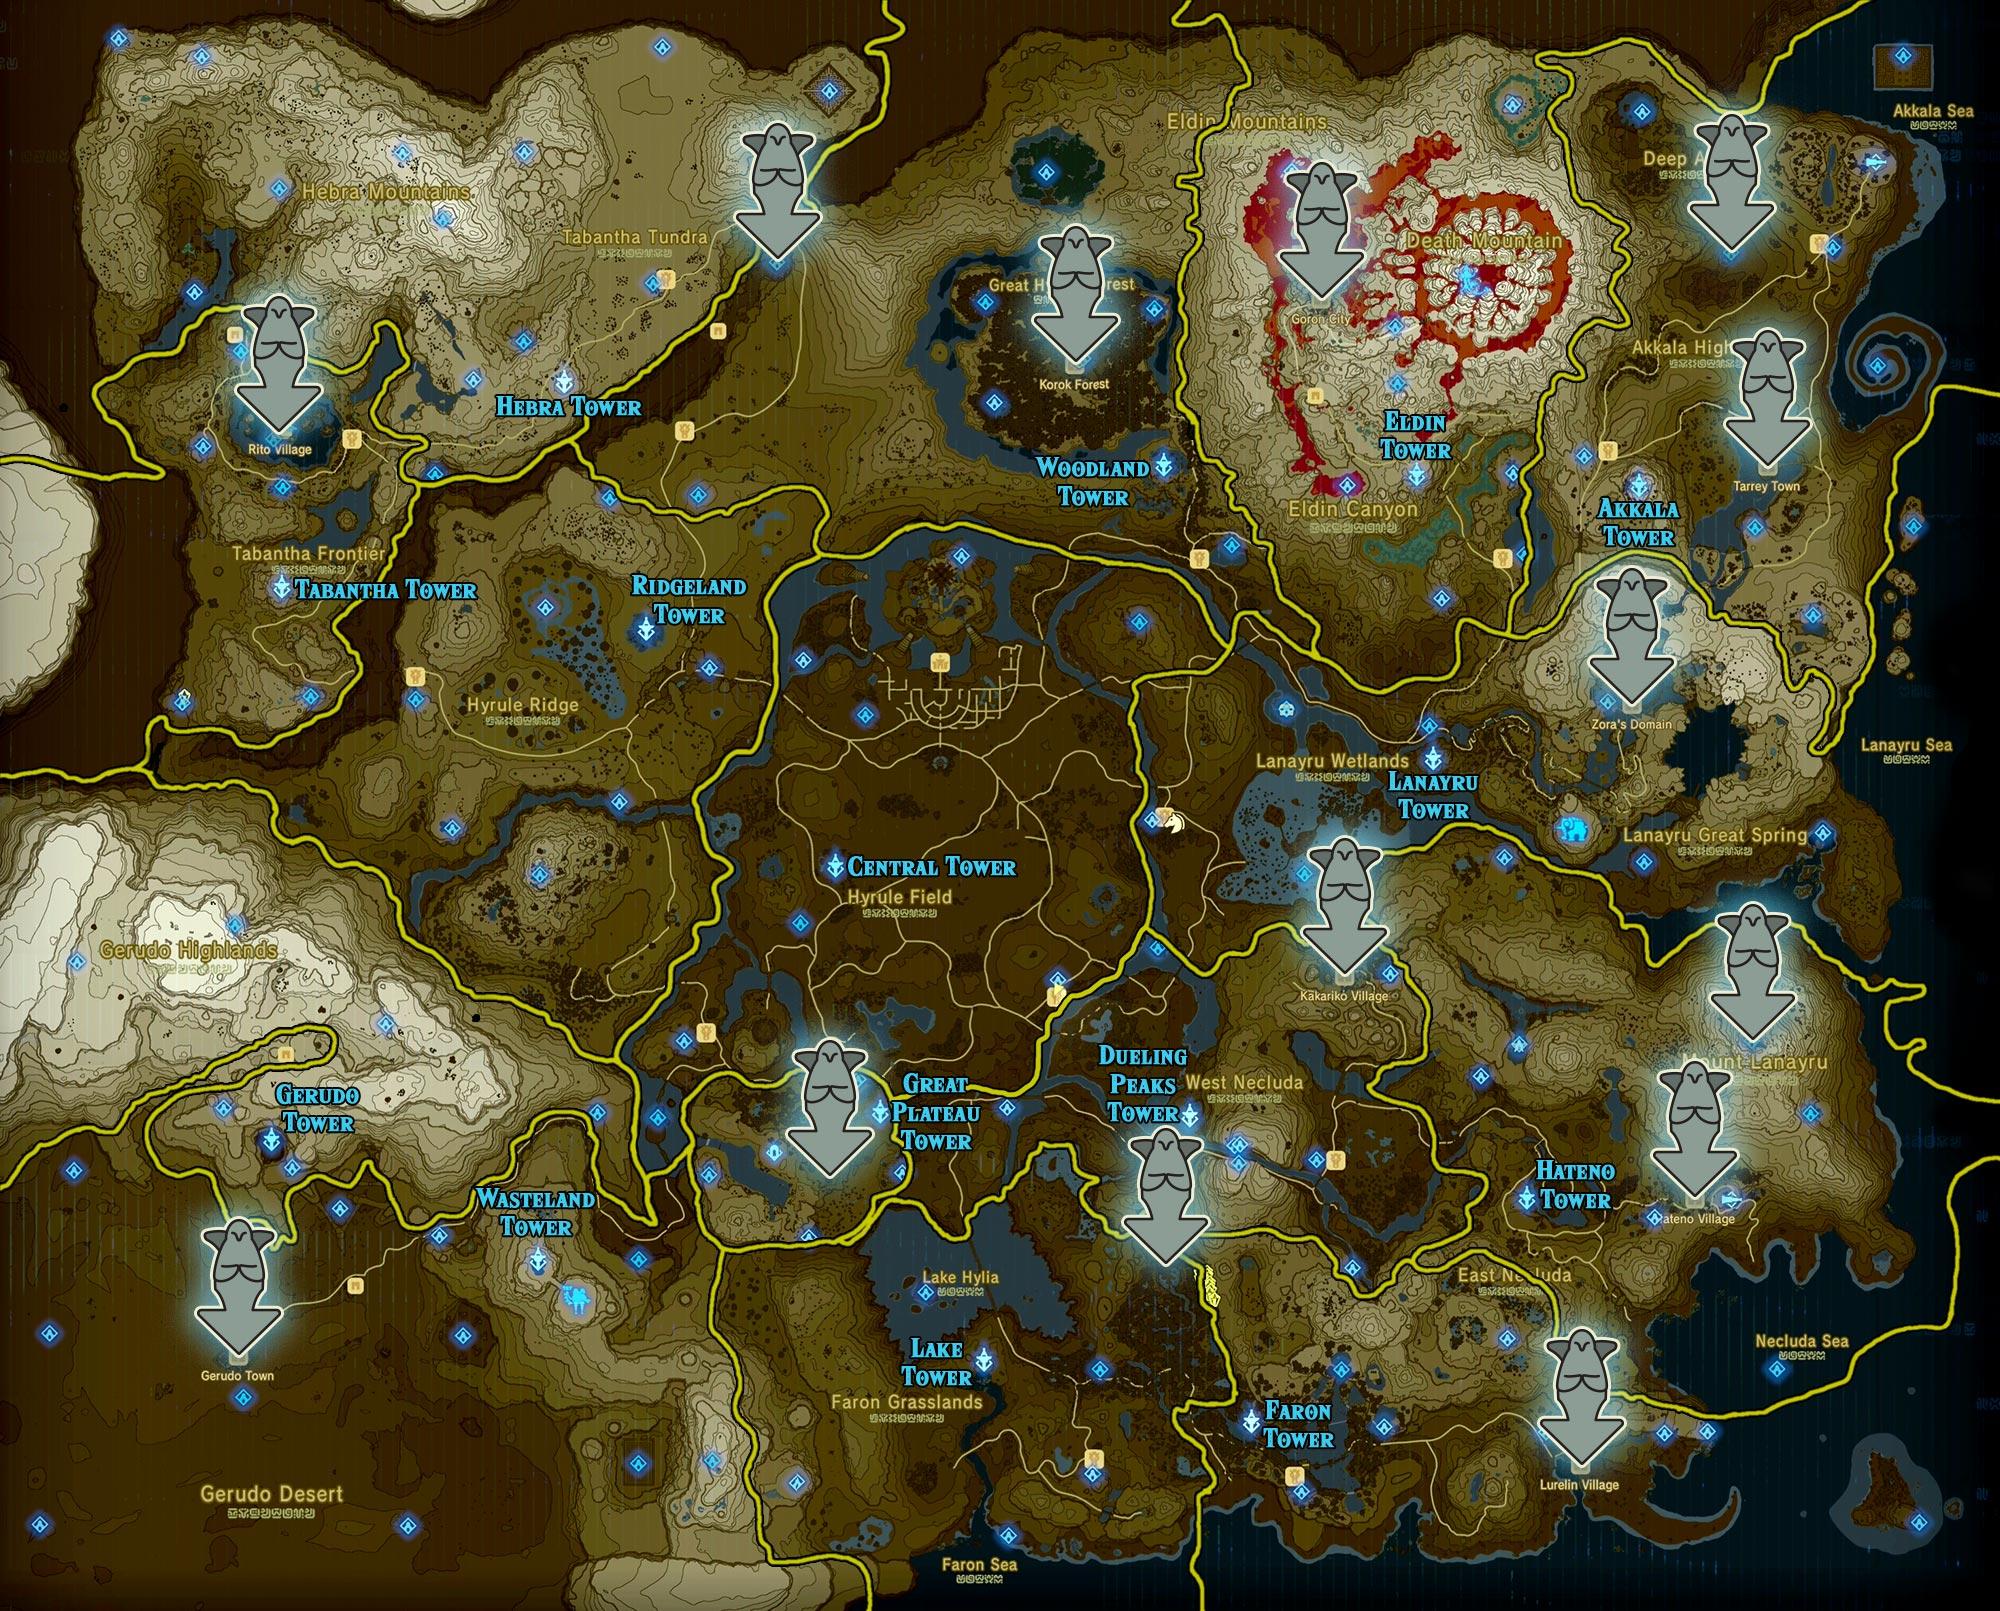 Zelda Breath of the Wild guide: Goddess statue locations